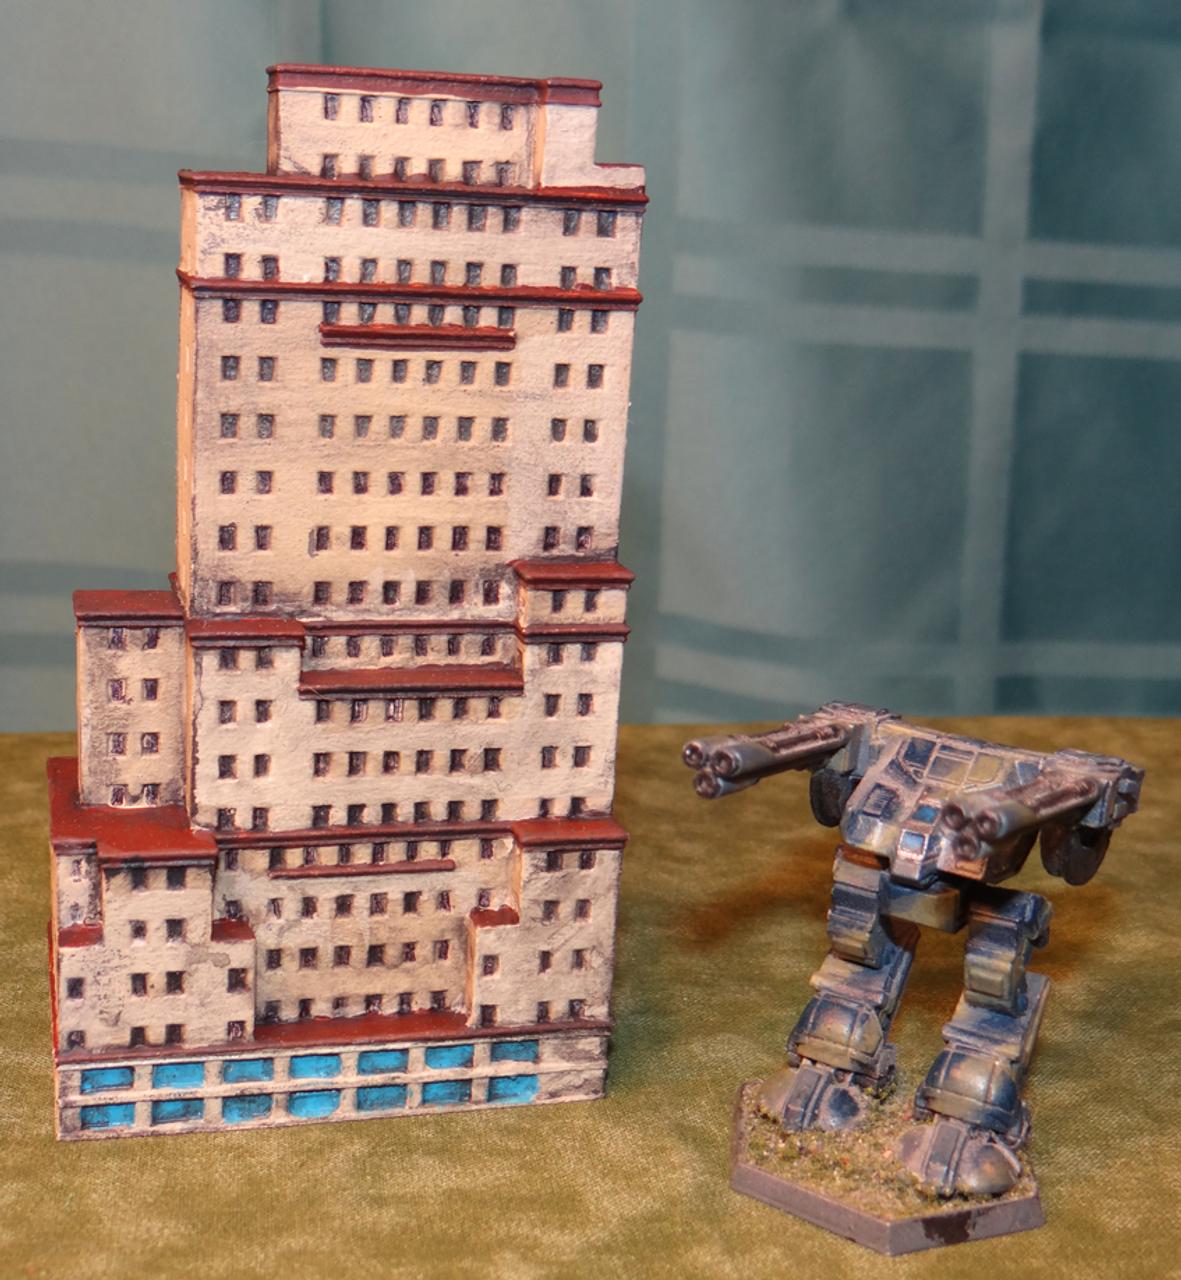 6mm Miniature Apartment Building